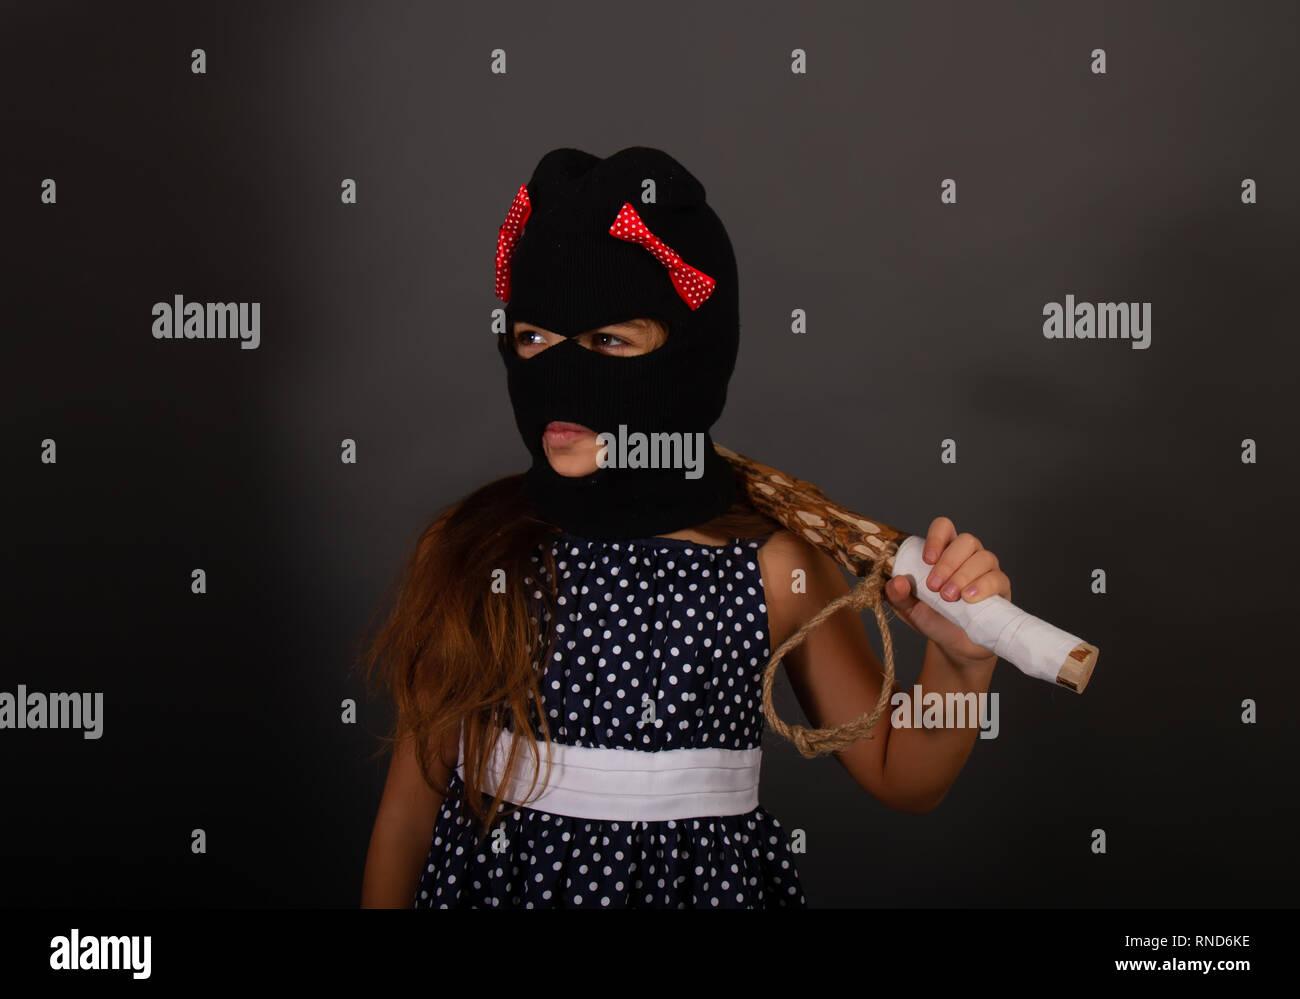 adf605afdedd7 One teenage girl hooligans in bright smart dress